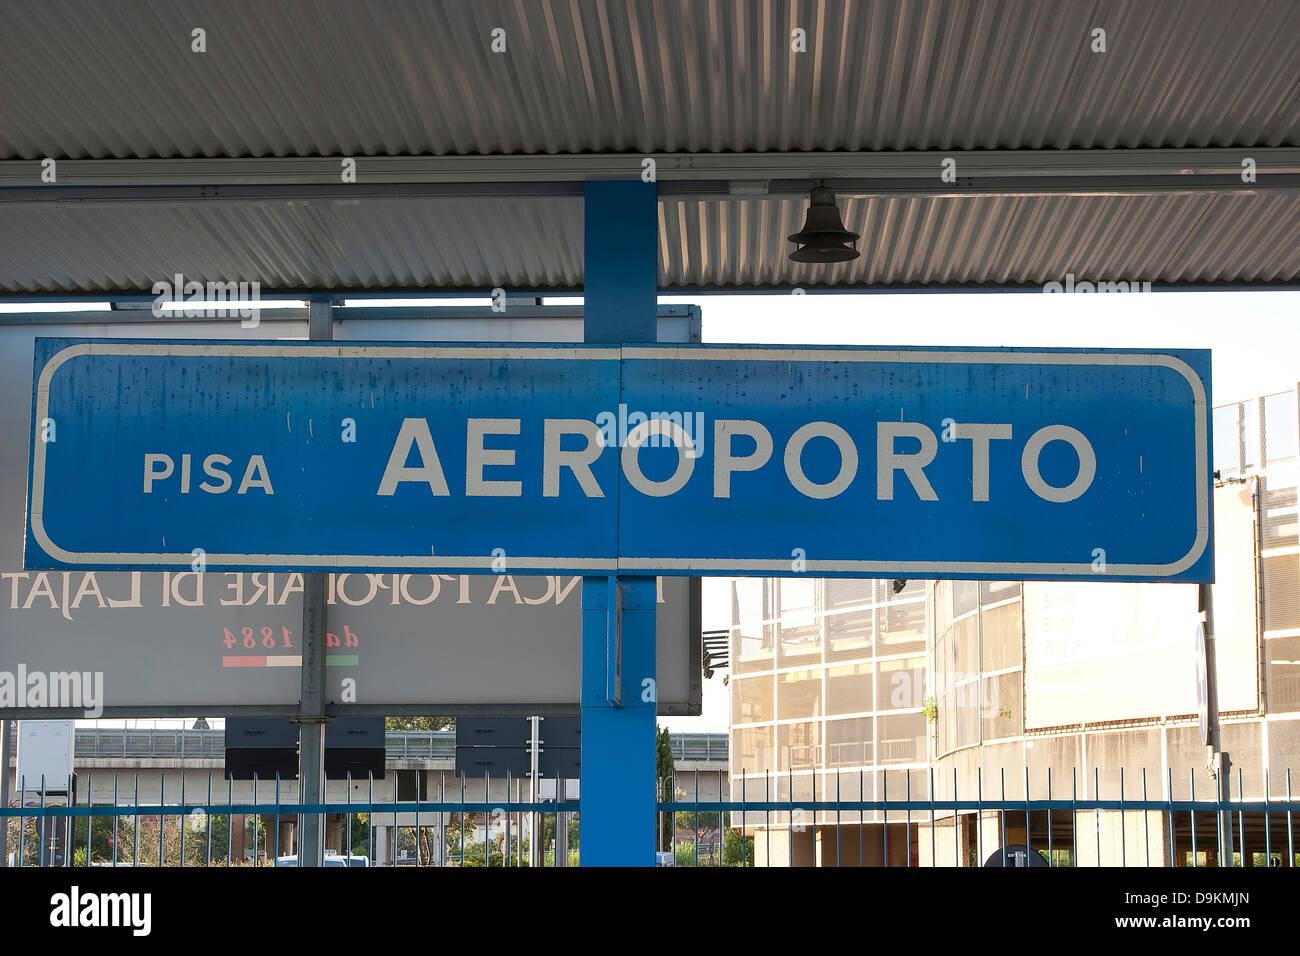 Aeroporto Pisa : A train station platform sign for pisa aeroporto pisa airport